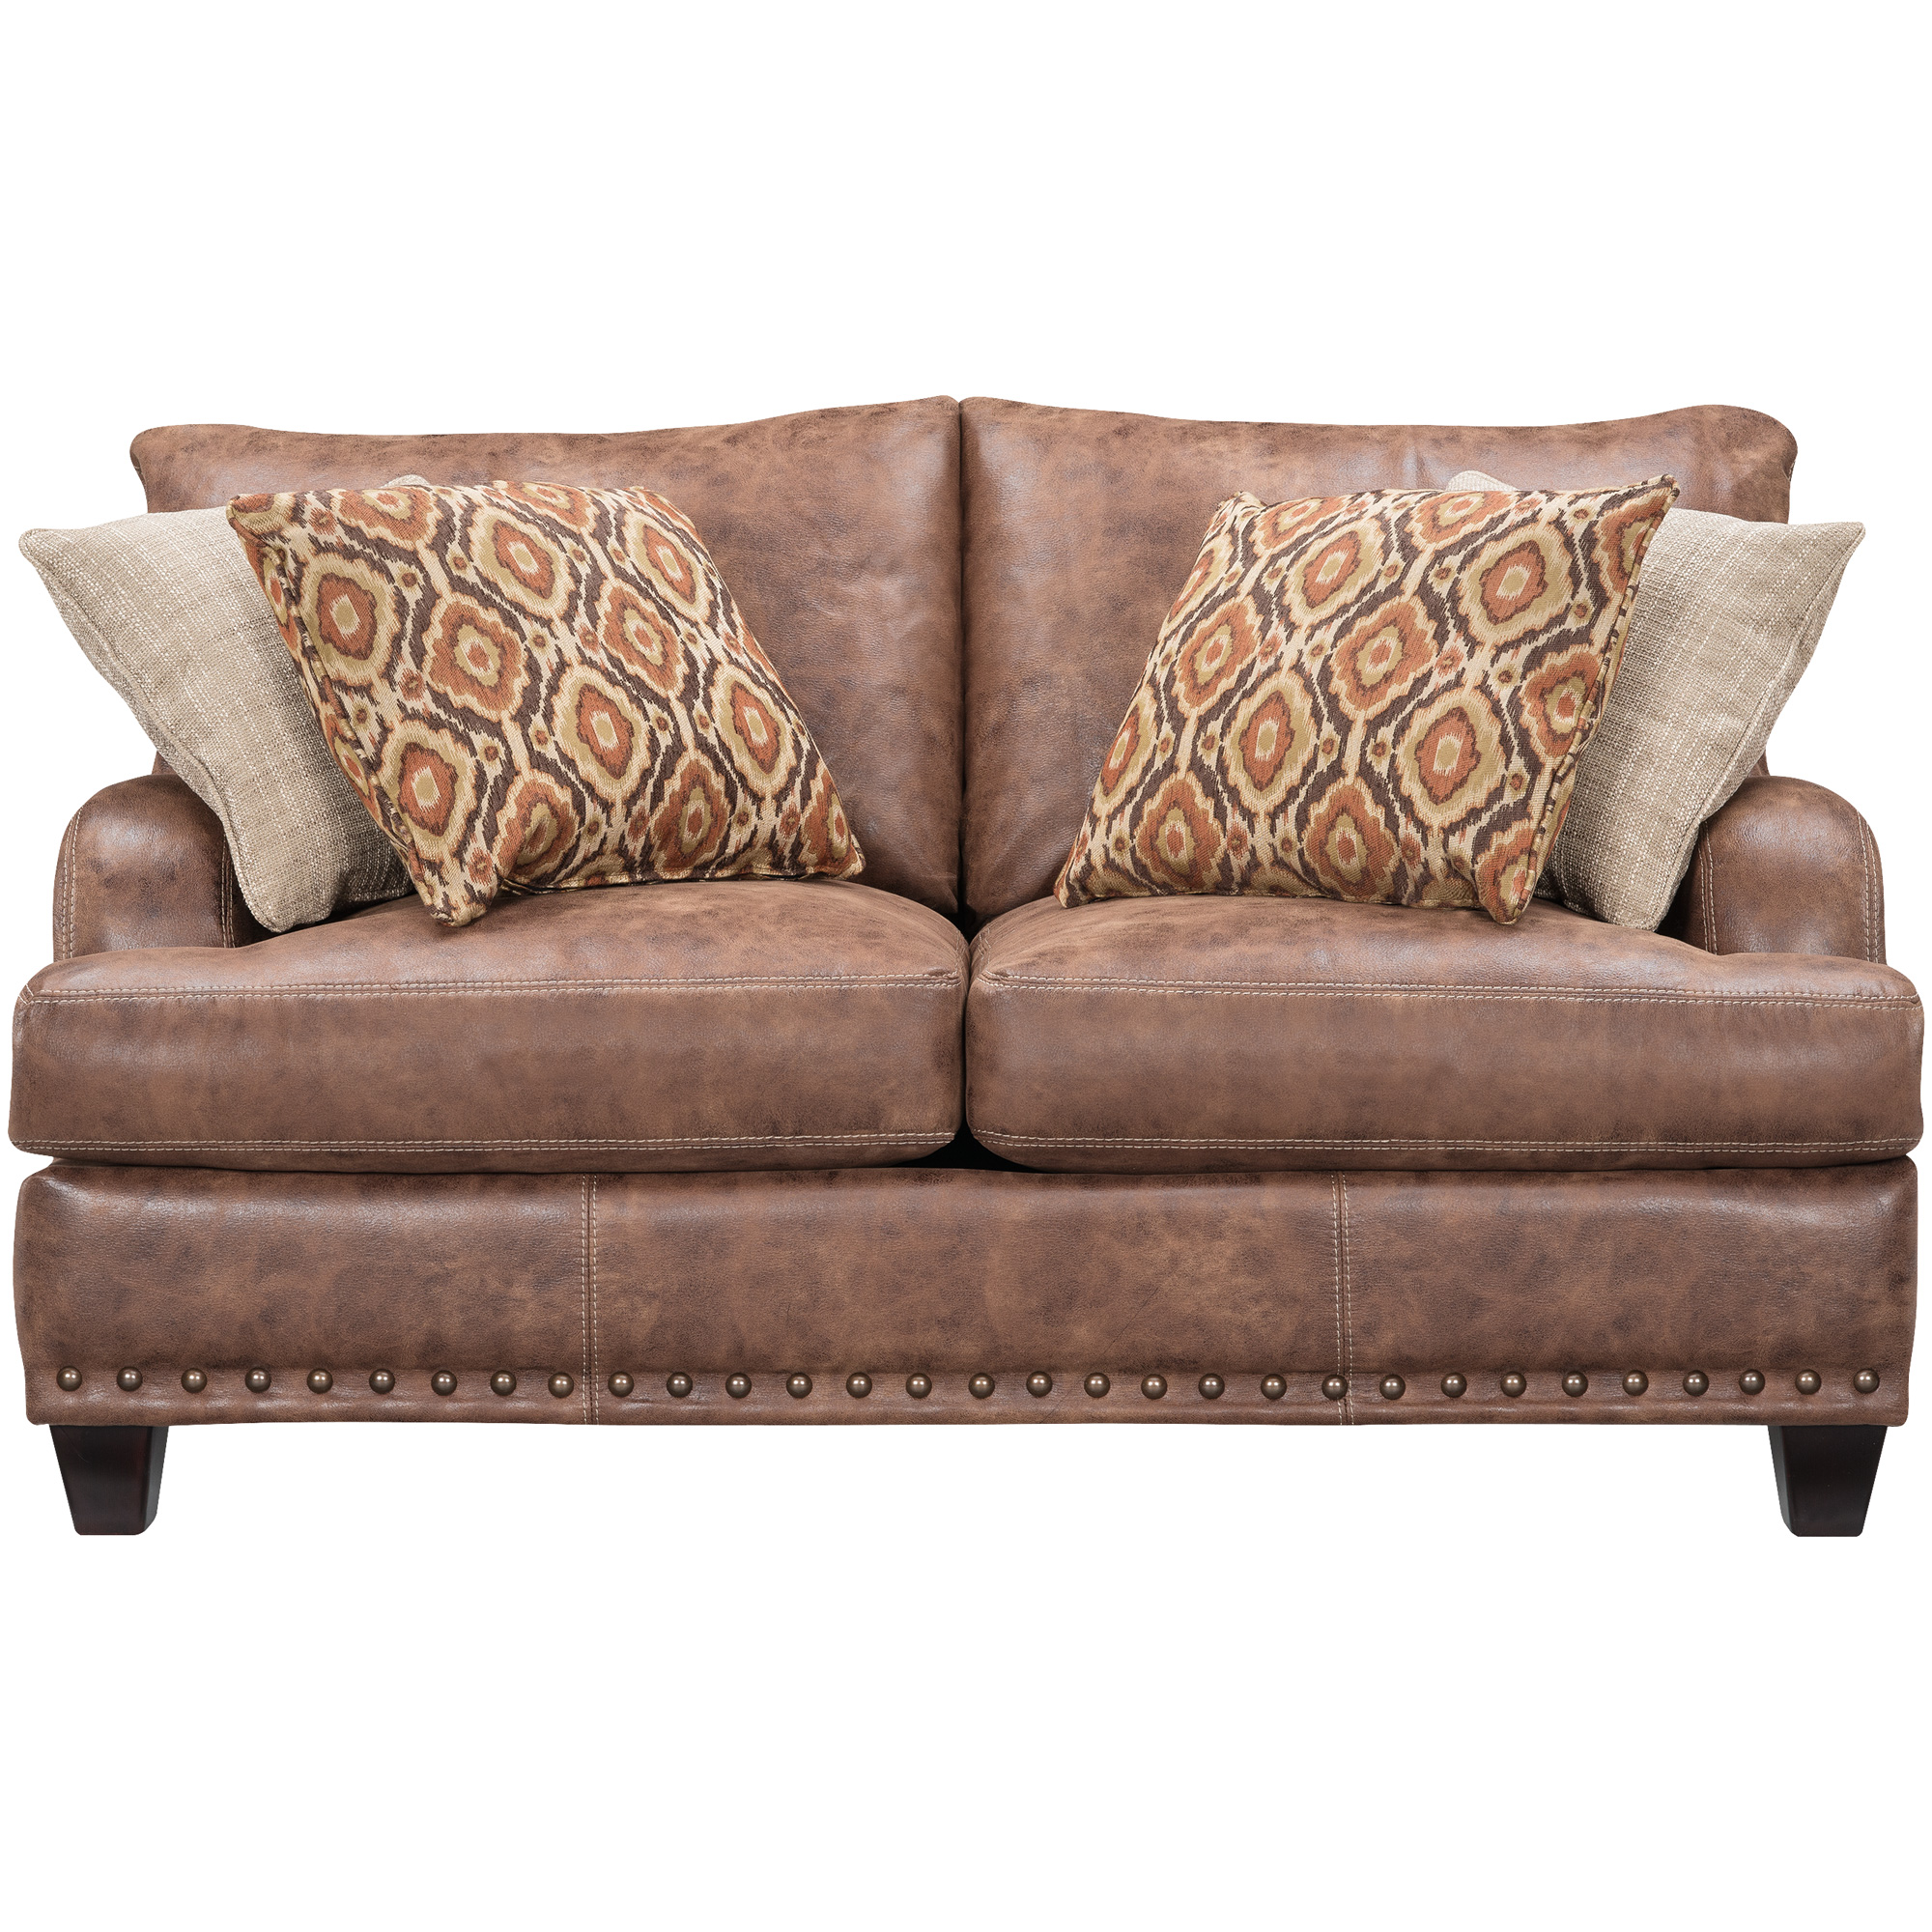 Franklin | Dexter Walnut Loveseat Sofa